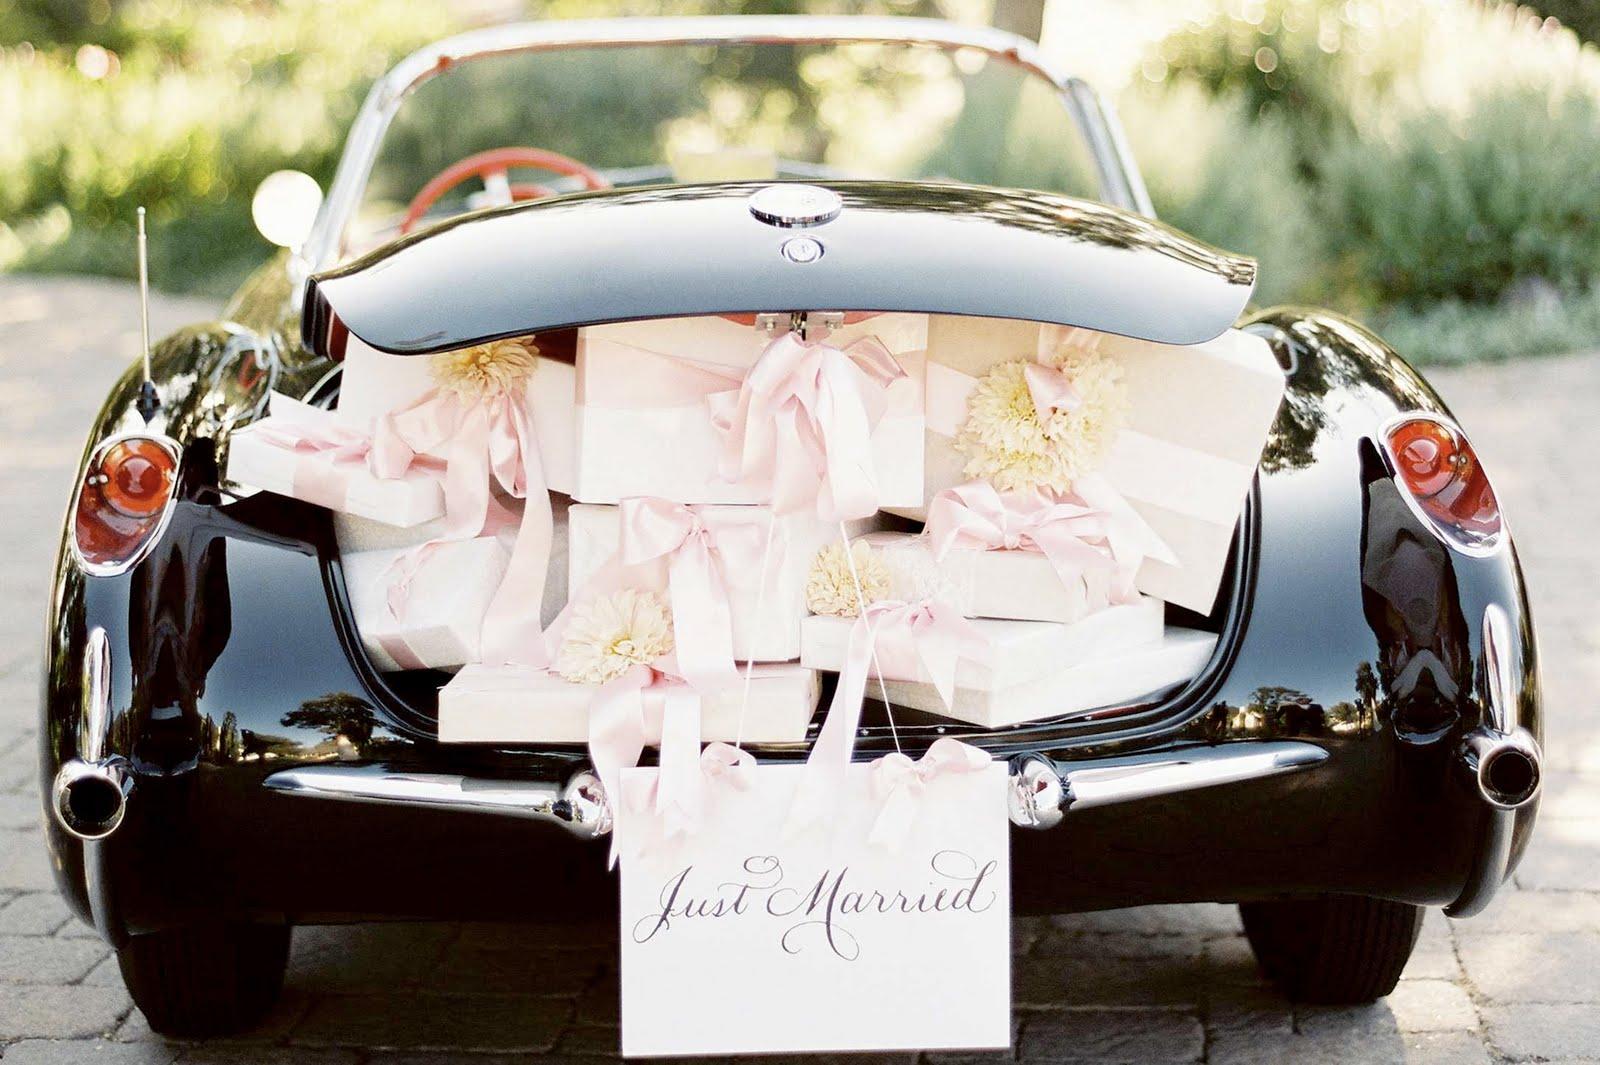 Wedding Car - What to choose? - Wedding Stories